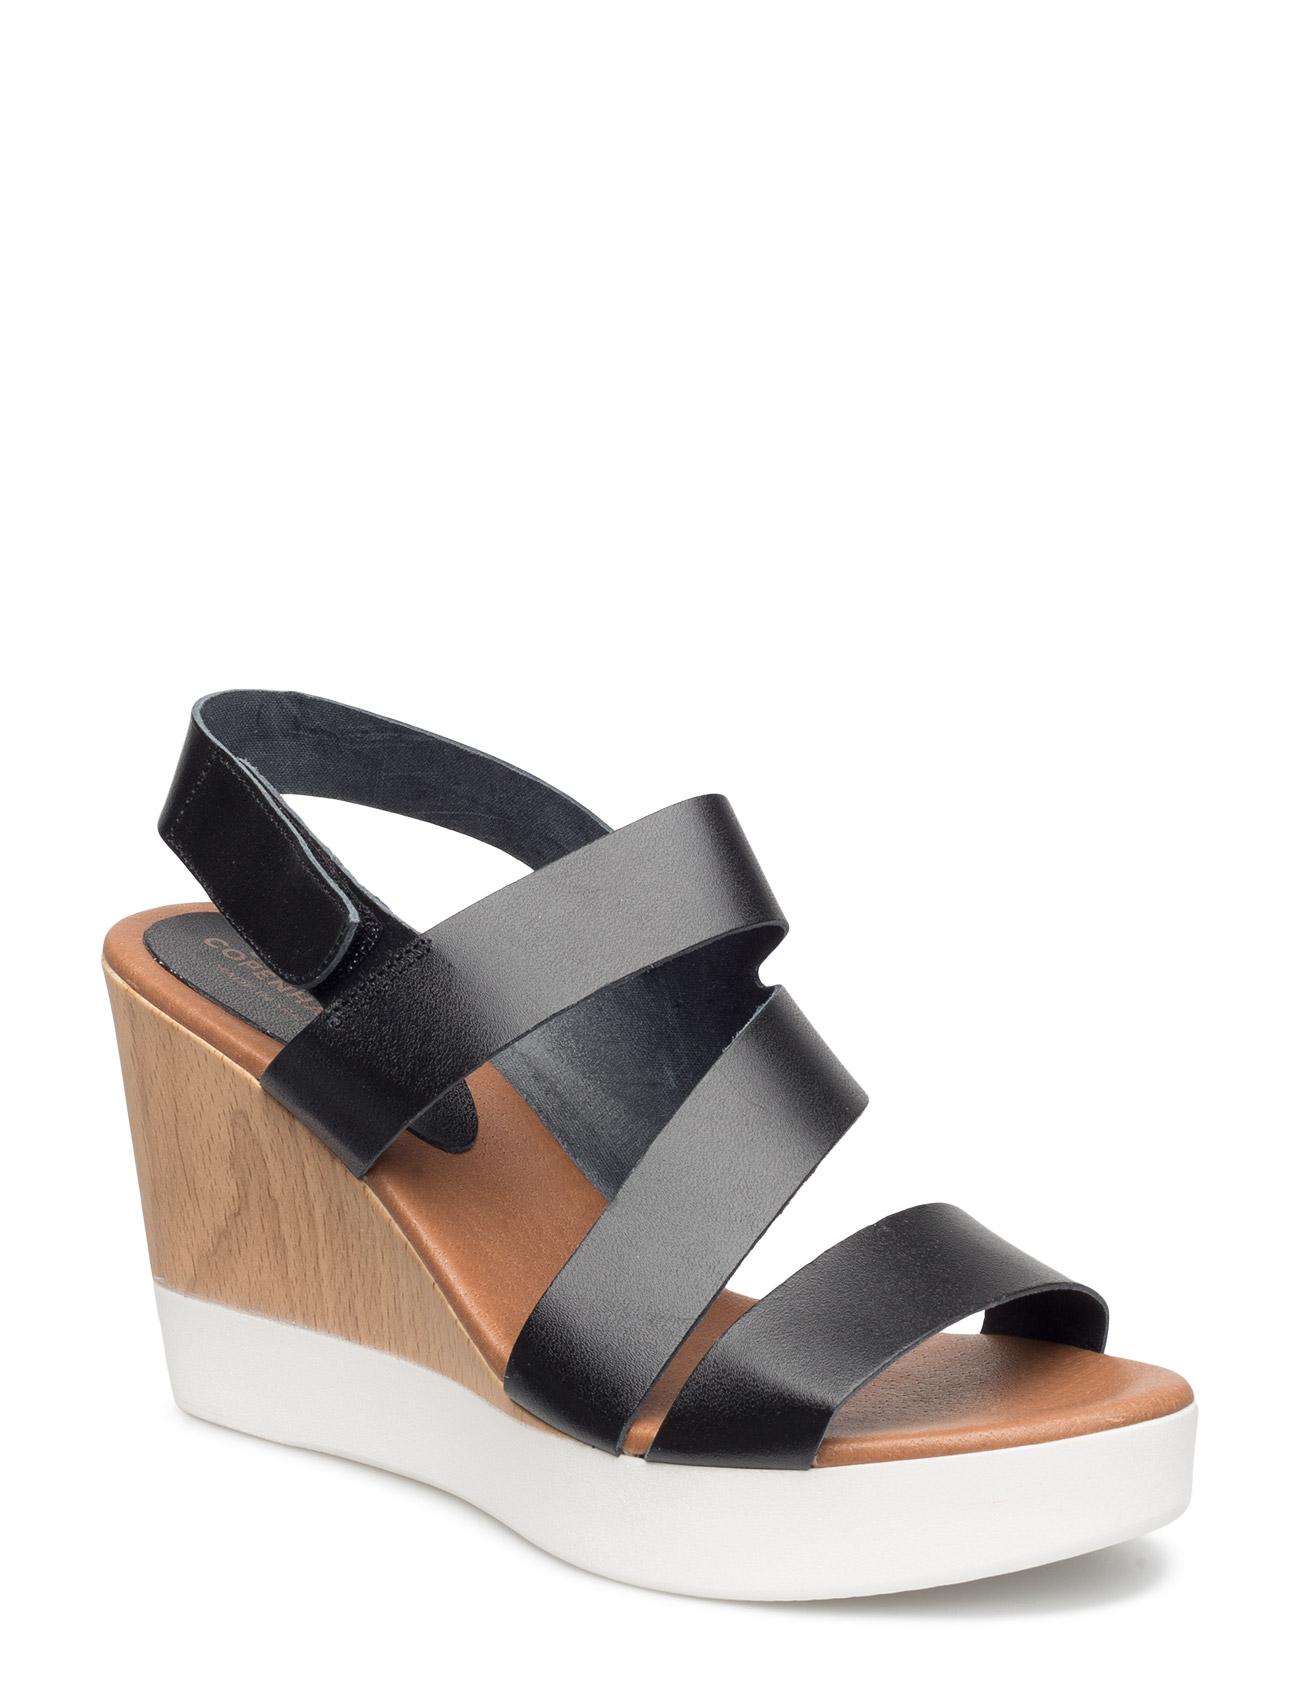 Sandal Shoebiz Sandaler til Damer i hvid